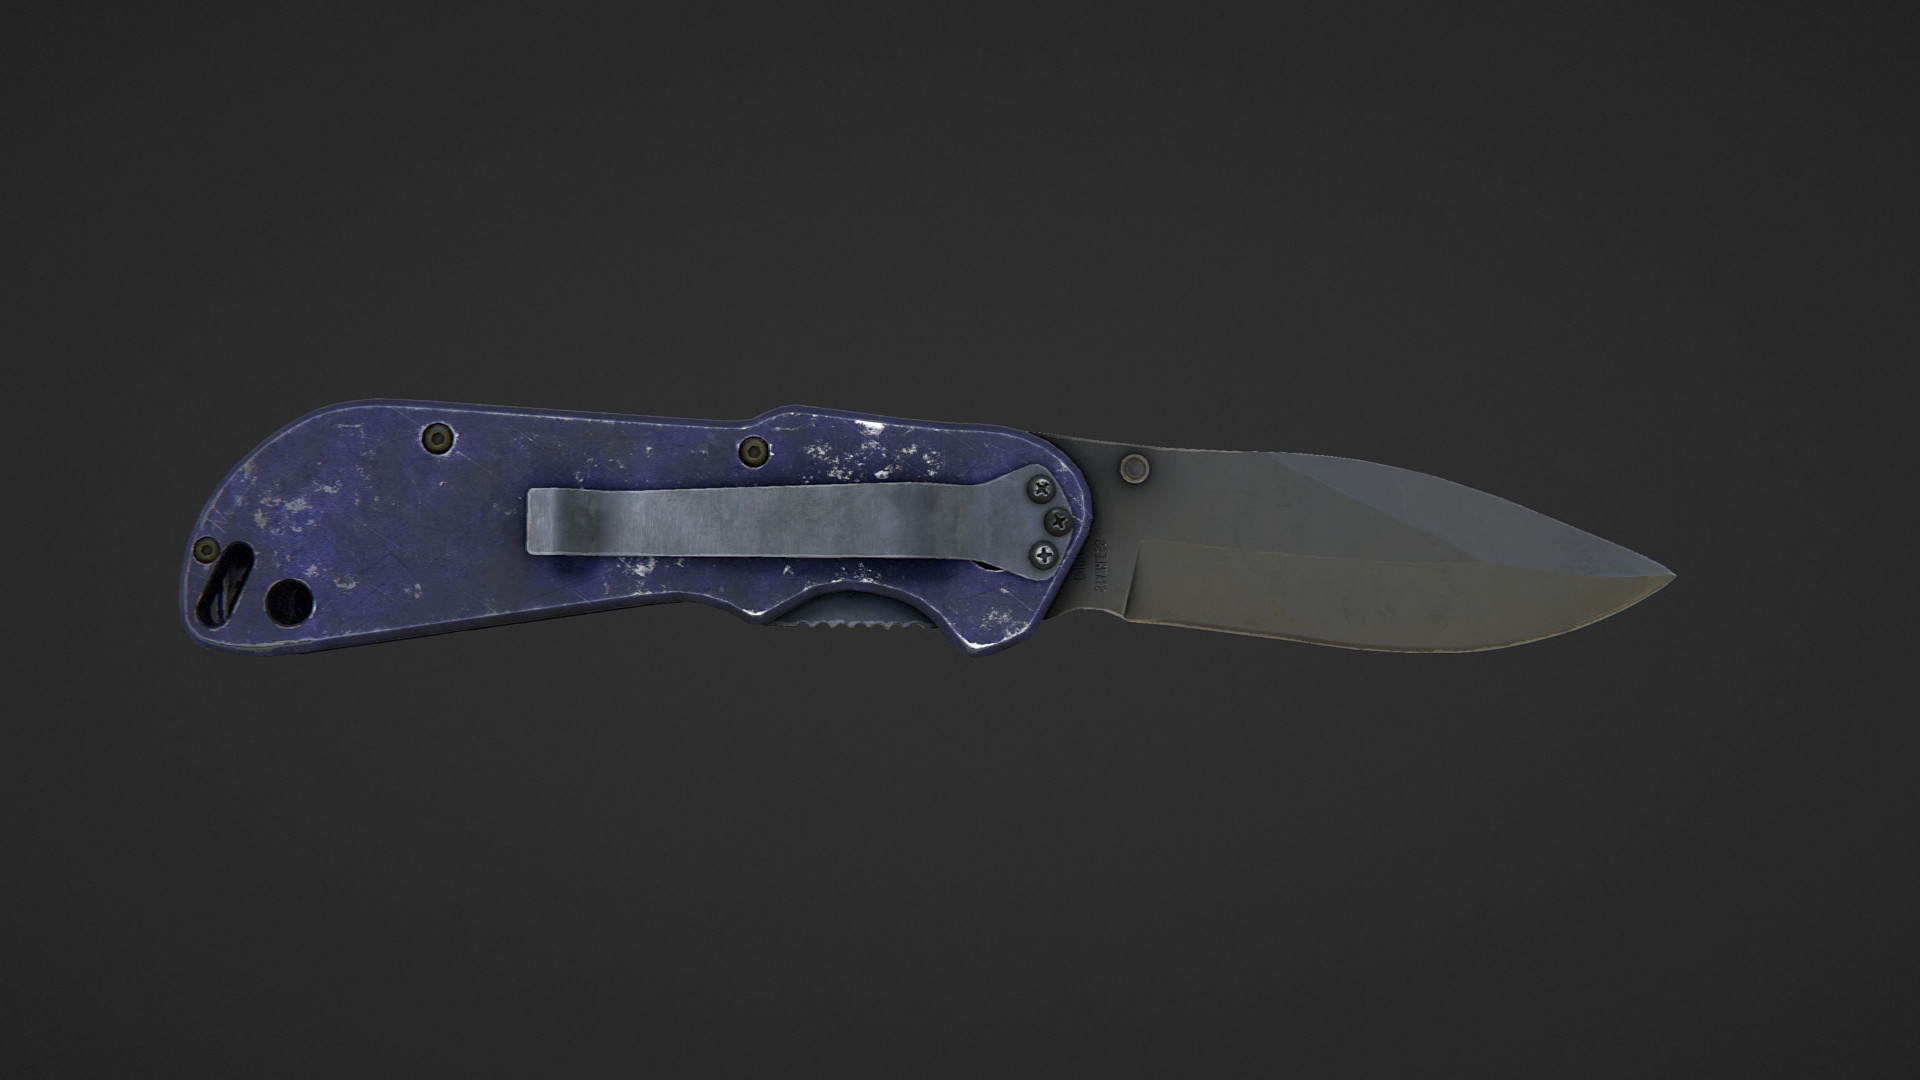 Joe Grabowski Folding Knife